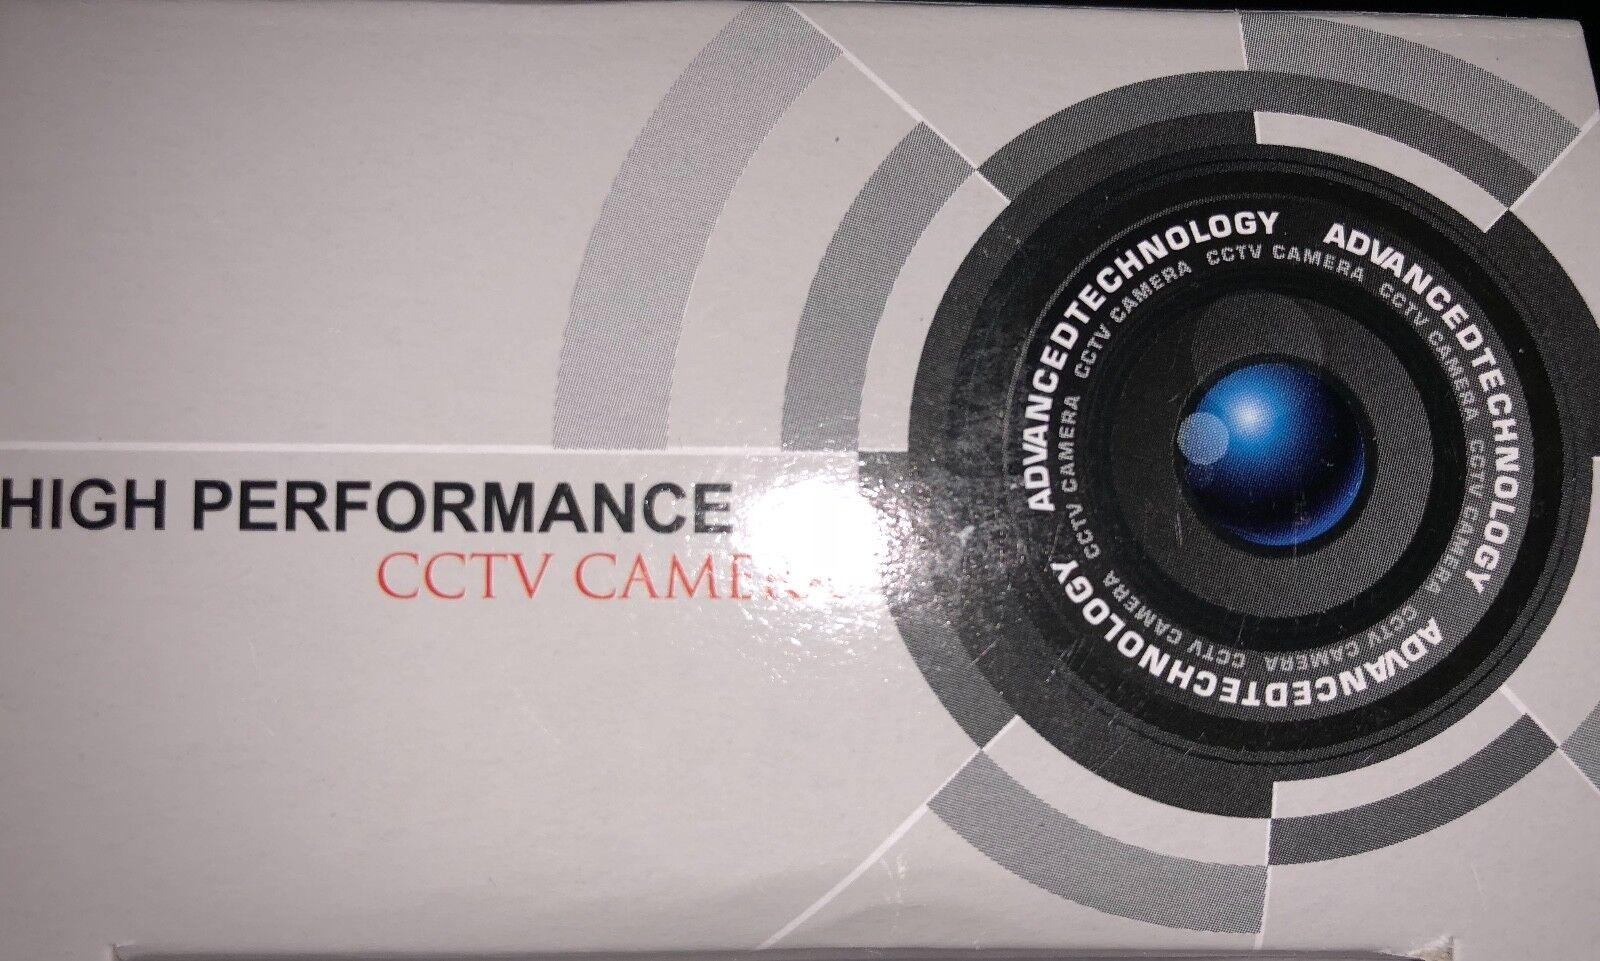 1-KT&C Lipstick Bullet Camera PAL CCD Mini Cam dnr230phwx In